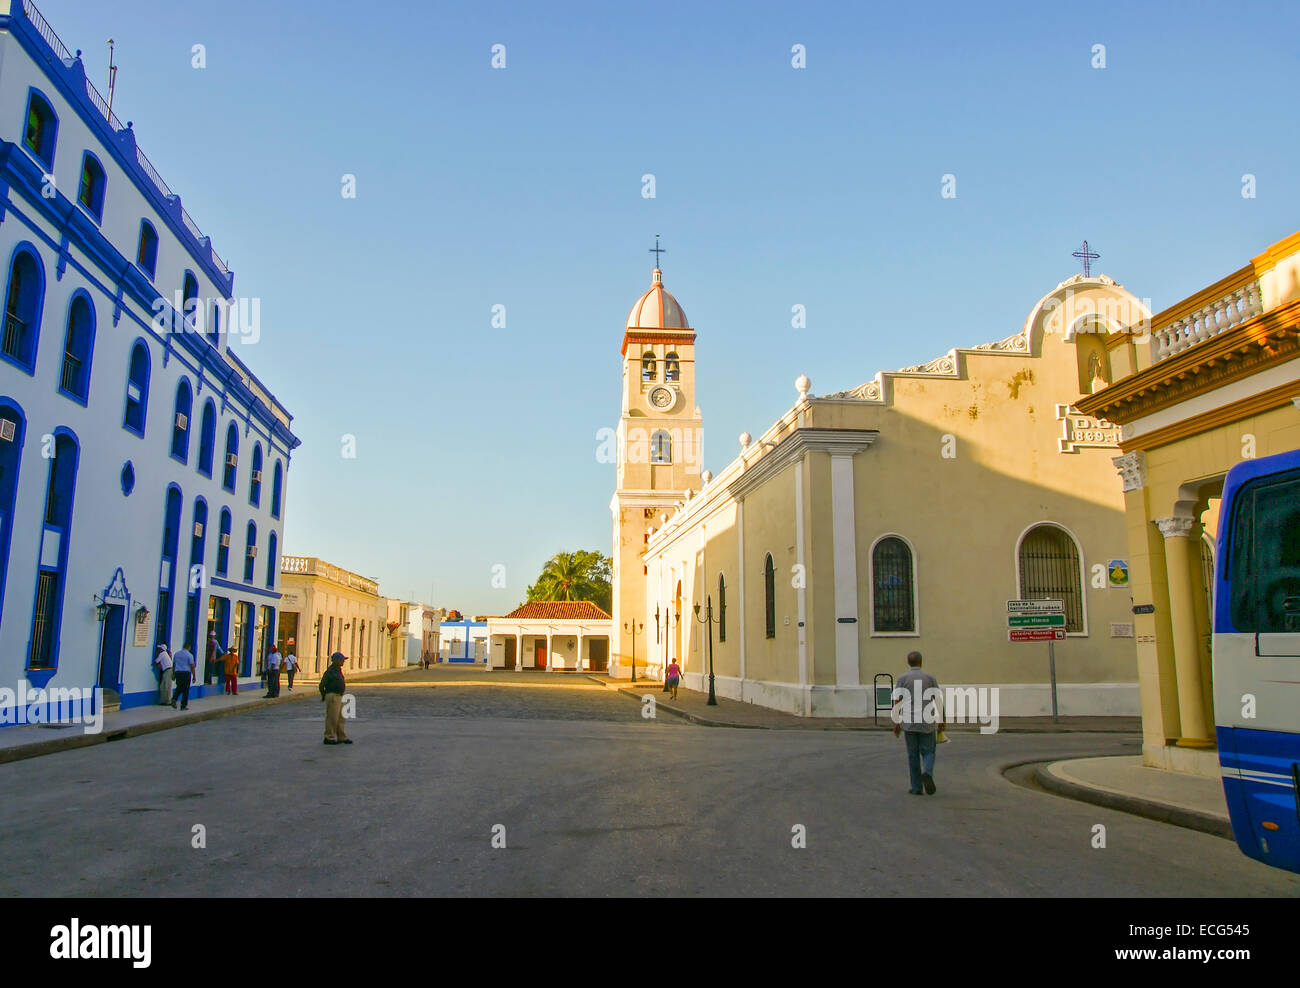 Iglesia del Santísimo Salvador, Bayamo, Kuba, Caribbean Stockbild